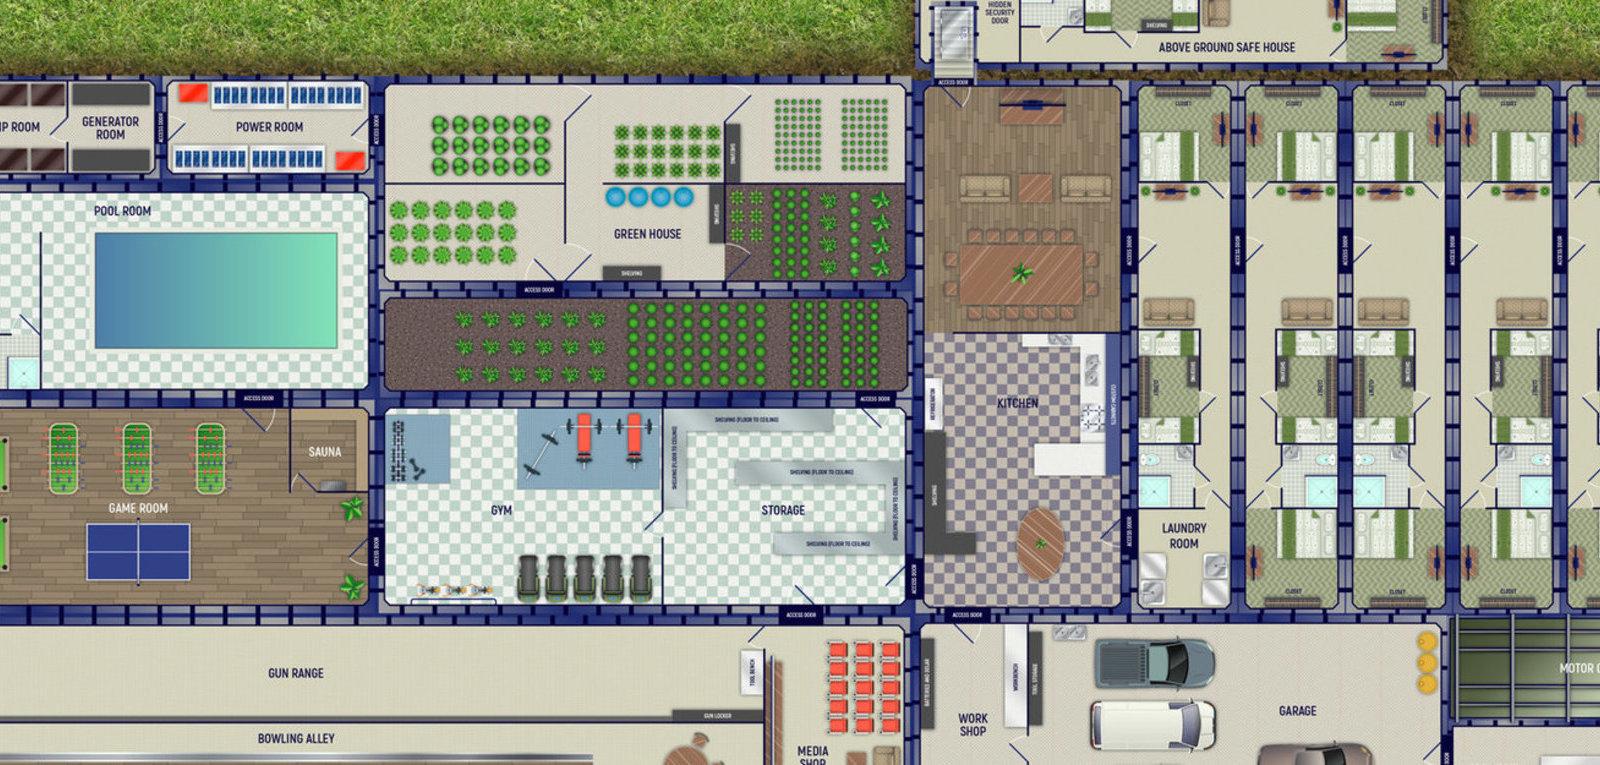 Floorplans Video Walkthrough Of Luxury Underground Bomb Shelters Core77